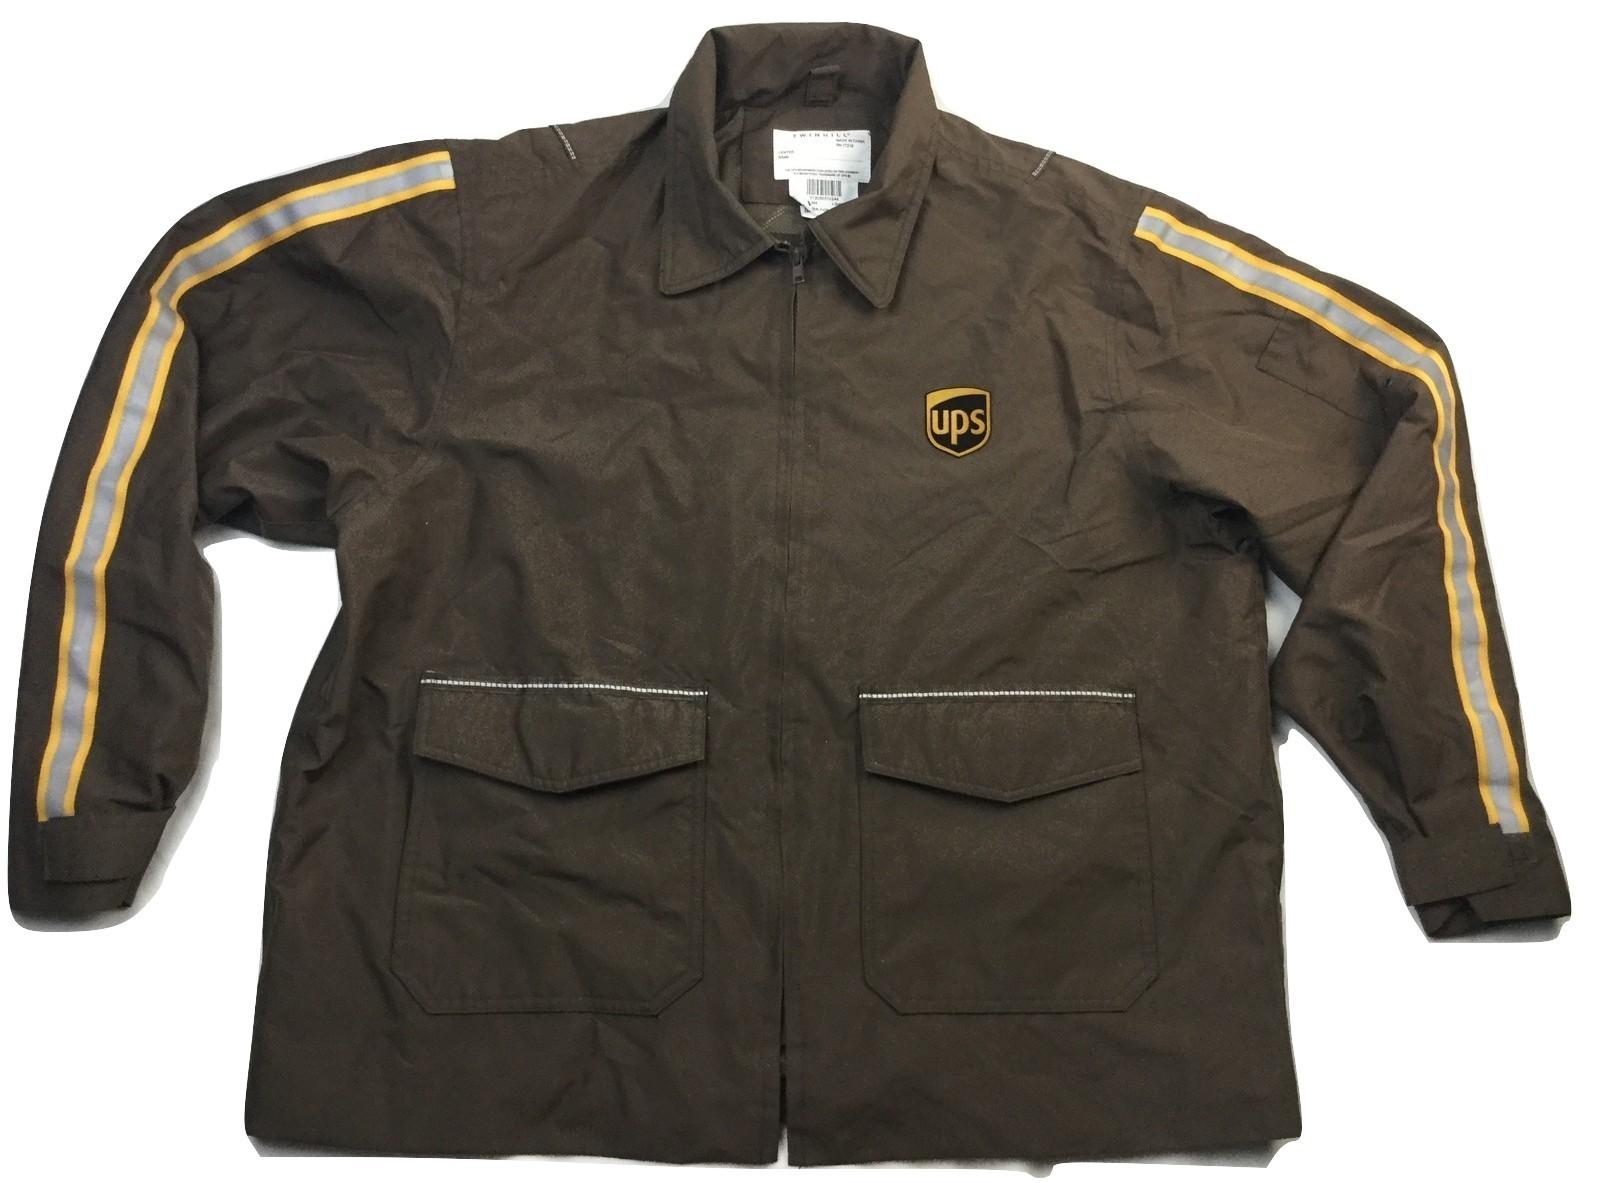 UPS Long Sleeve Full Zip Brown Rain Jacket Adult Men's Size L  (42-44) large